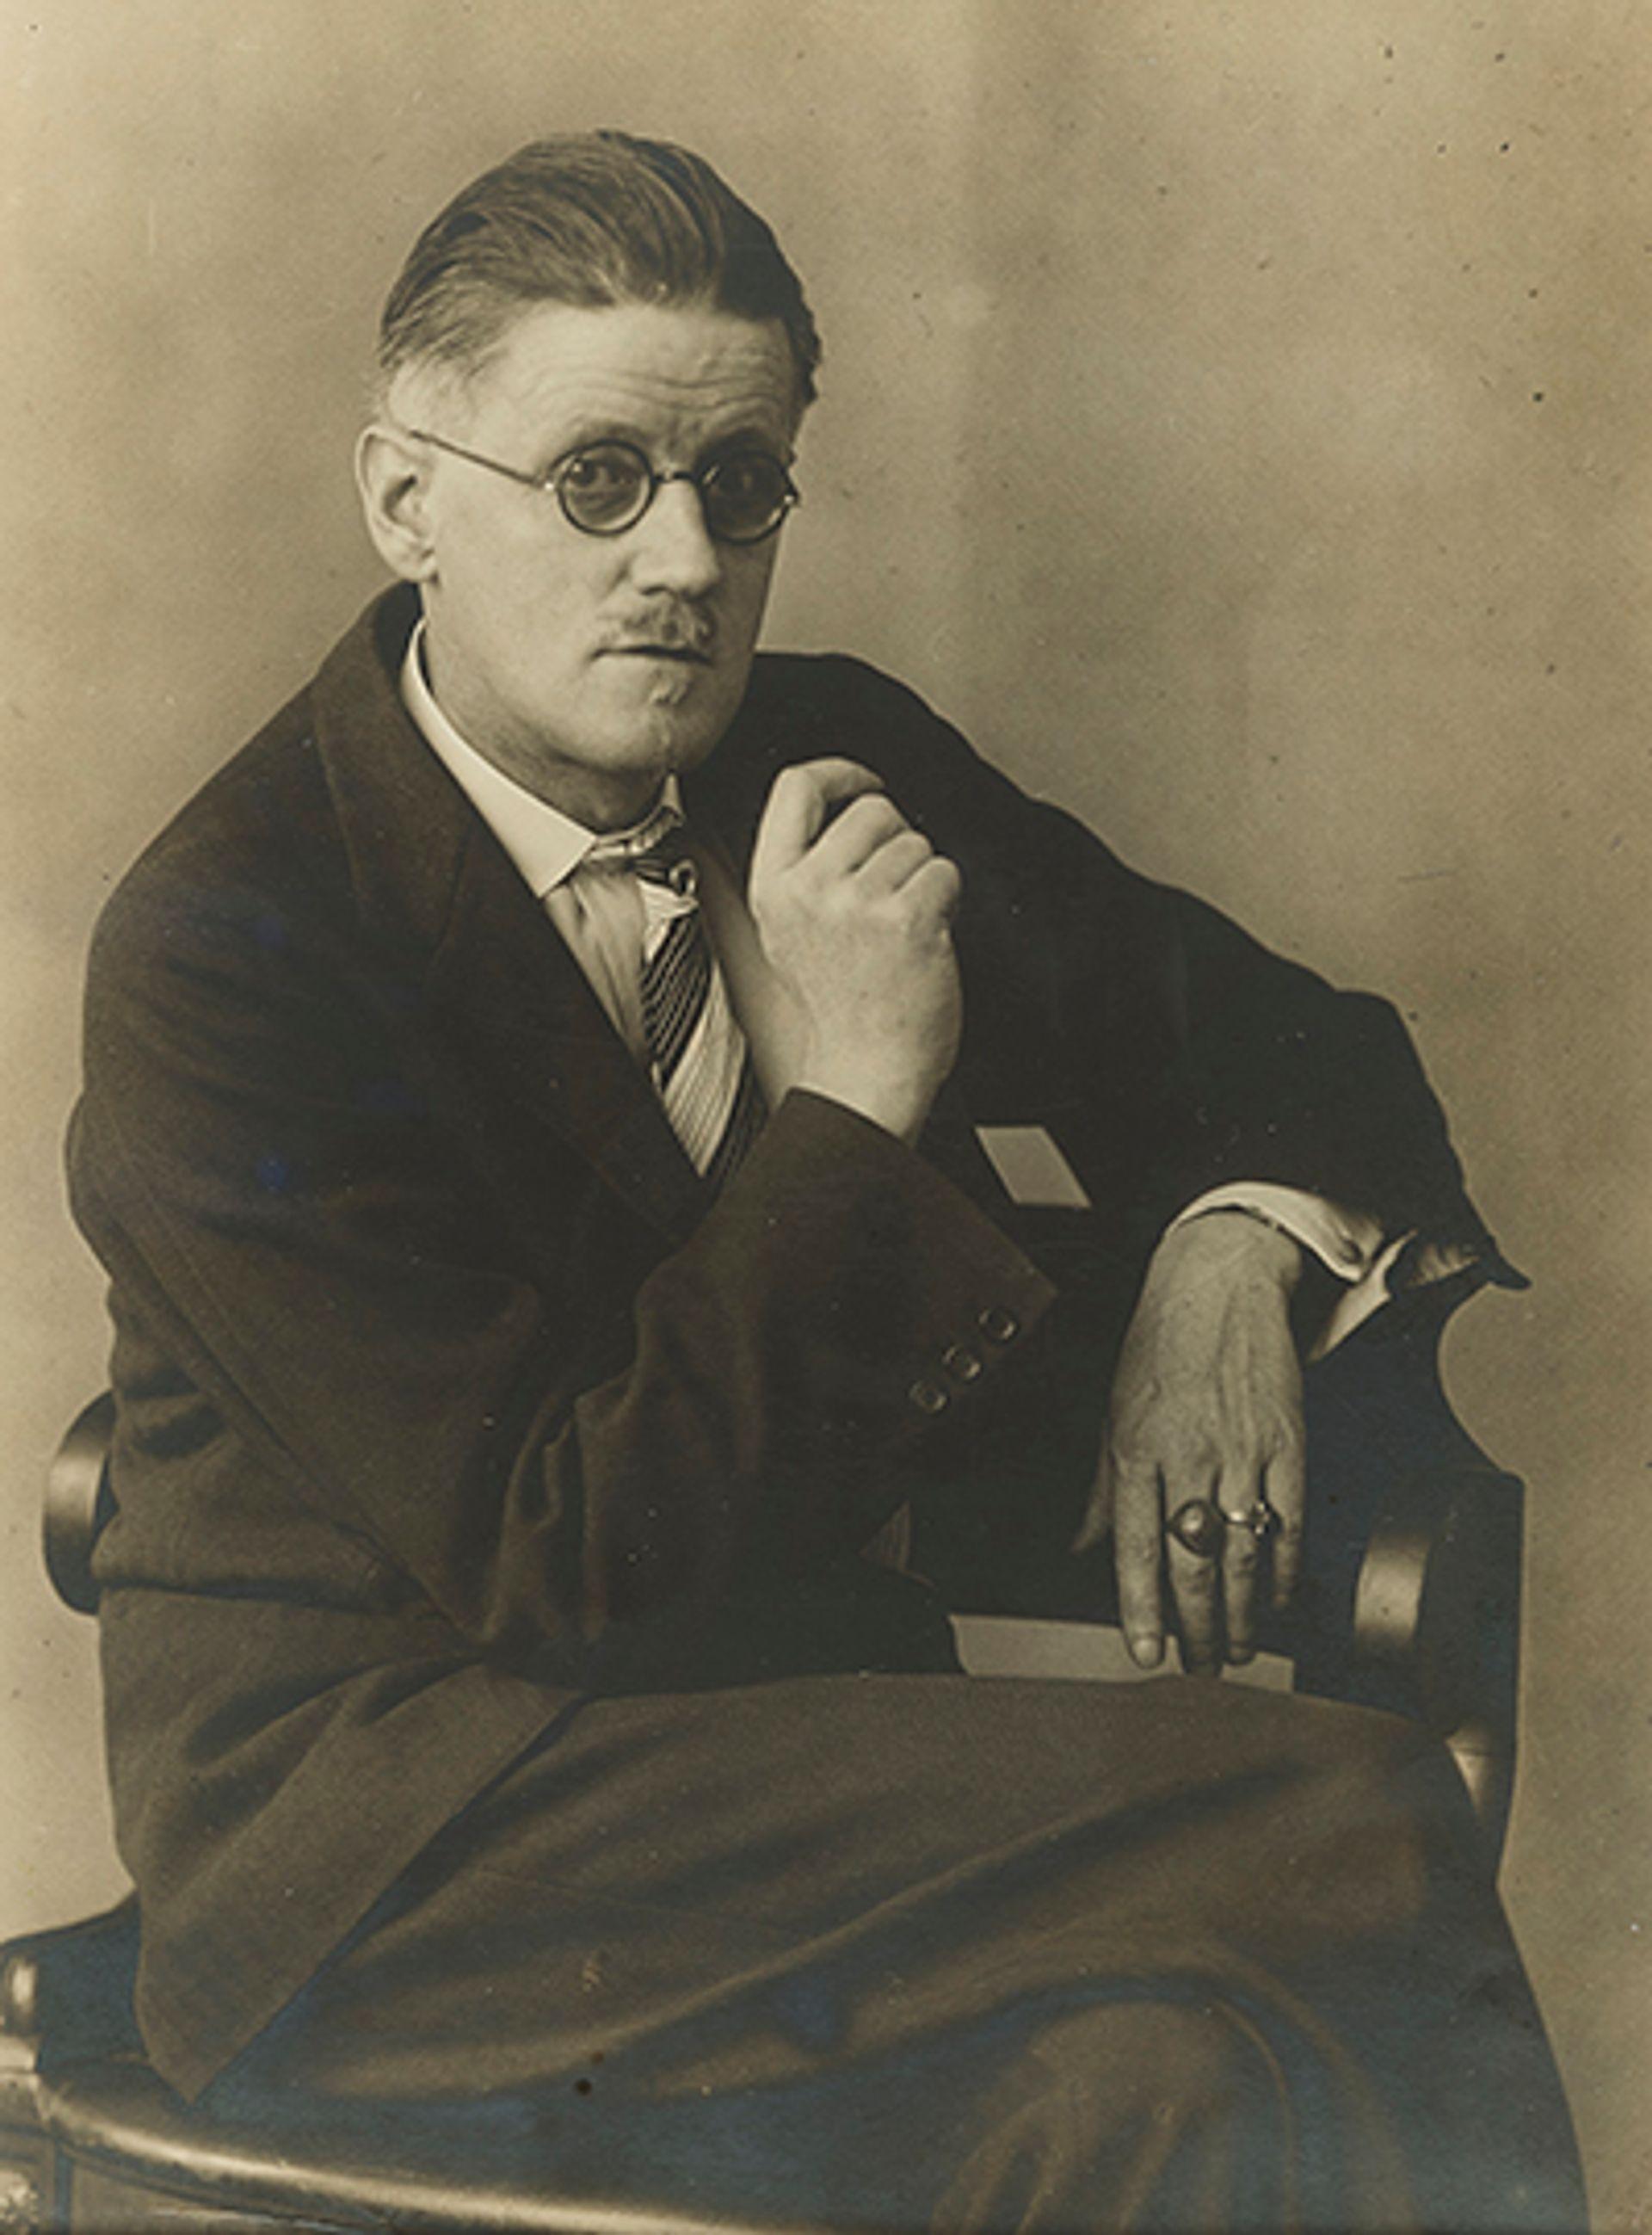 Portrait of James Joyce by Berenice Abbott Sutton